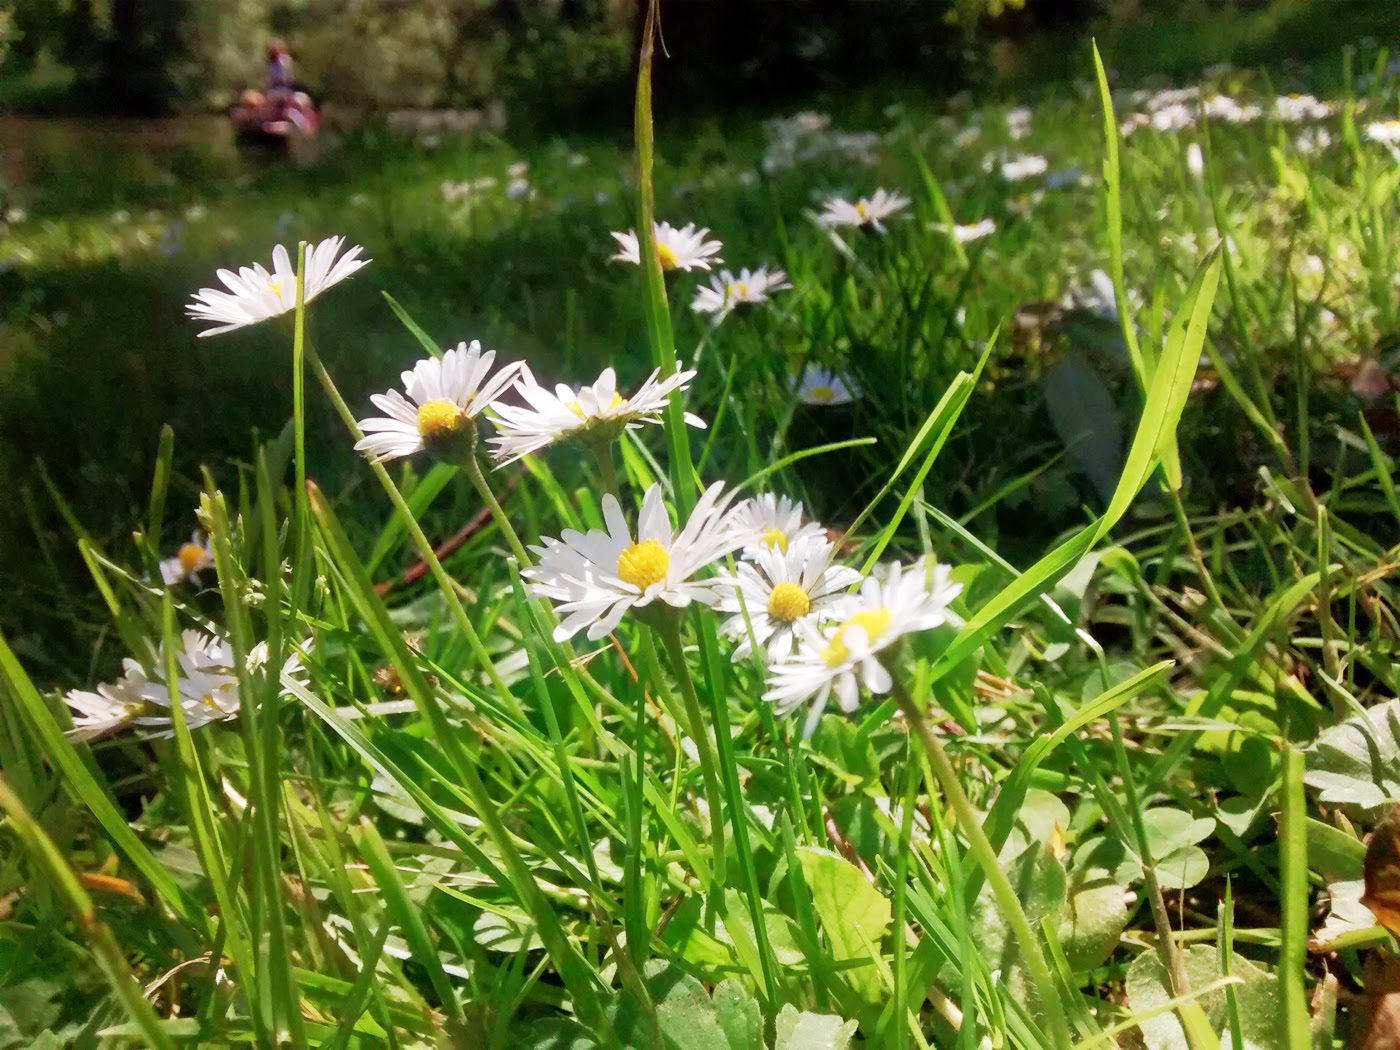 University Park daisies